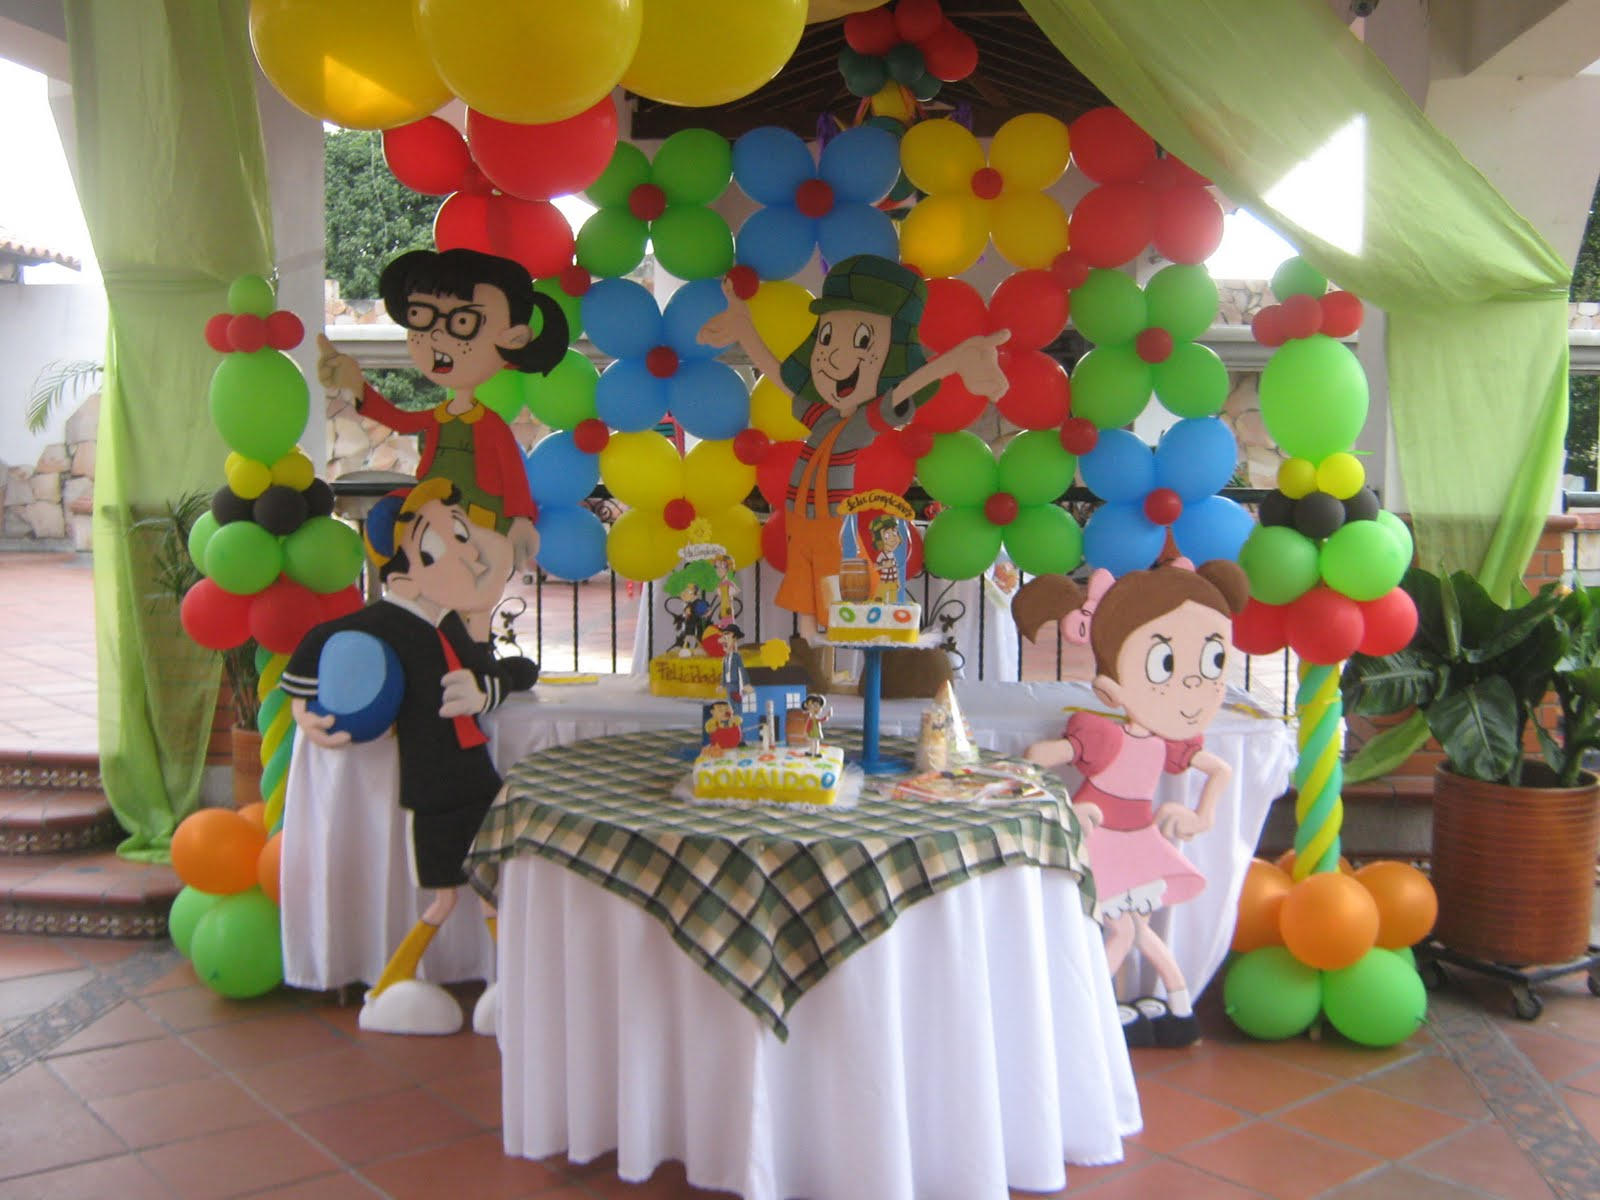 Decoracion fiesta tematica karaoke for Decoracion para pared infantil